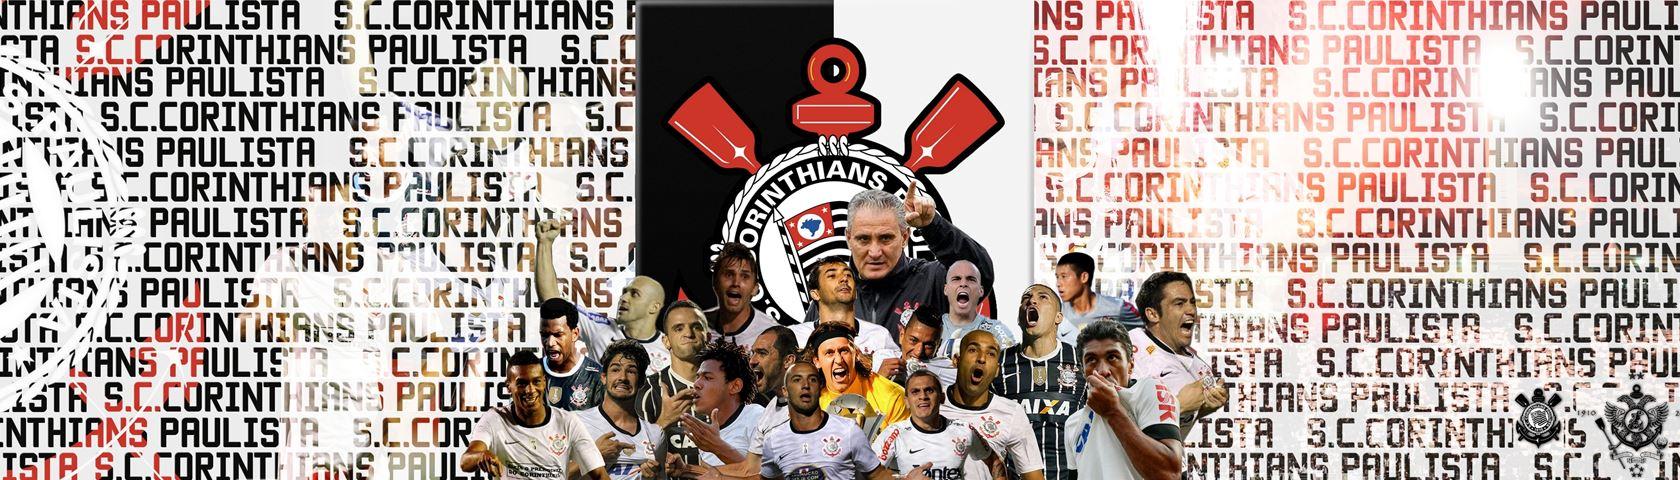 S.C. Corinthians Paulista 2